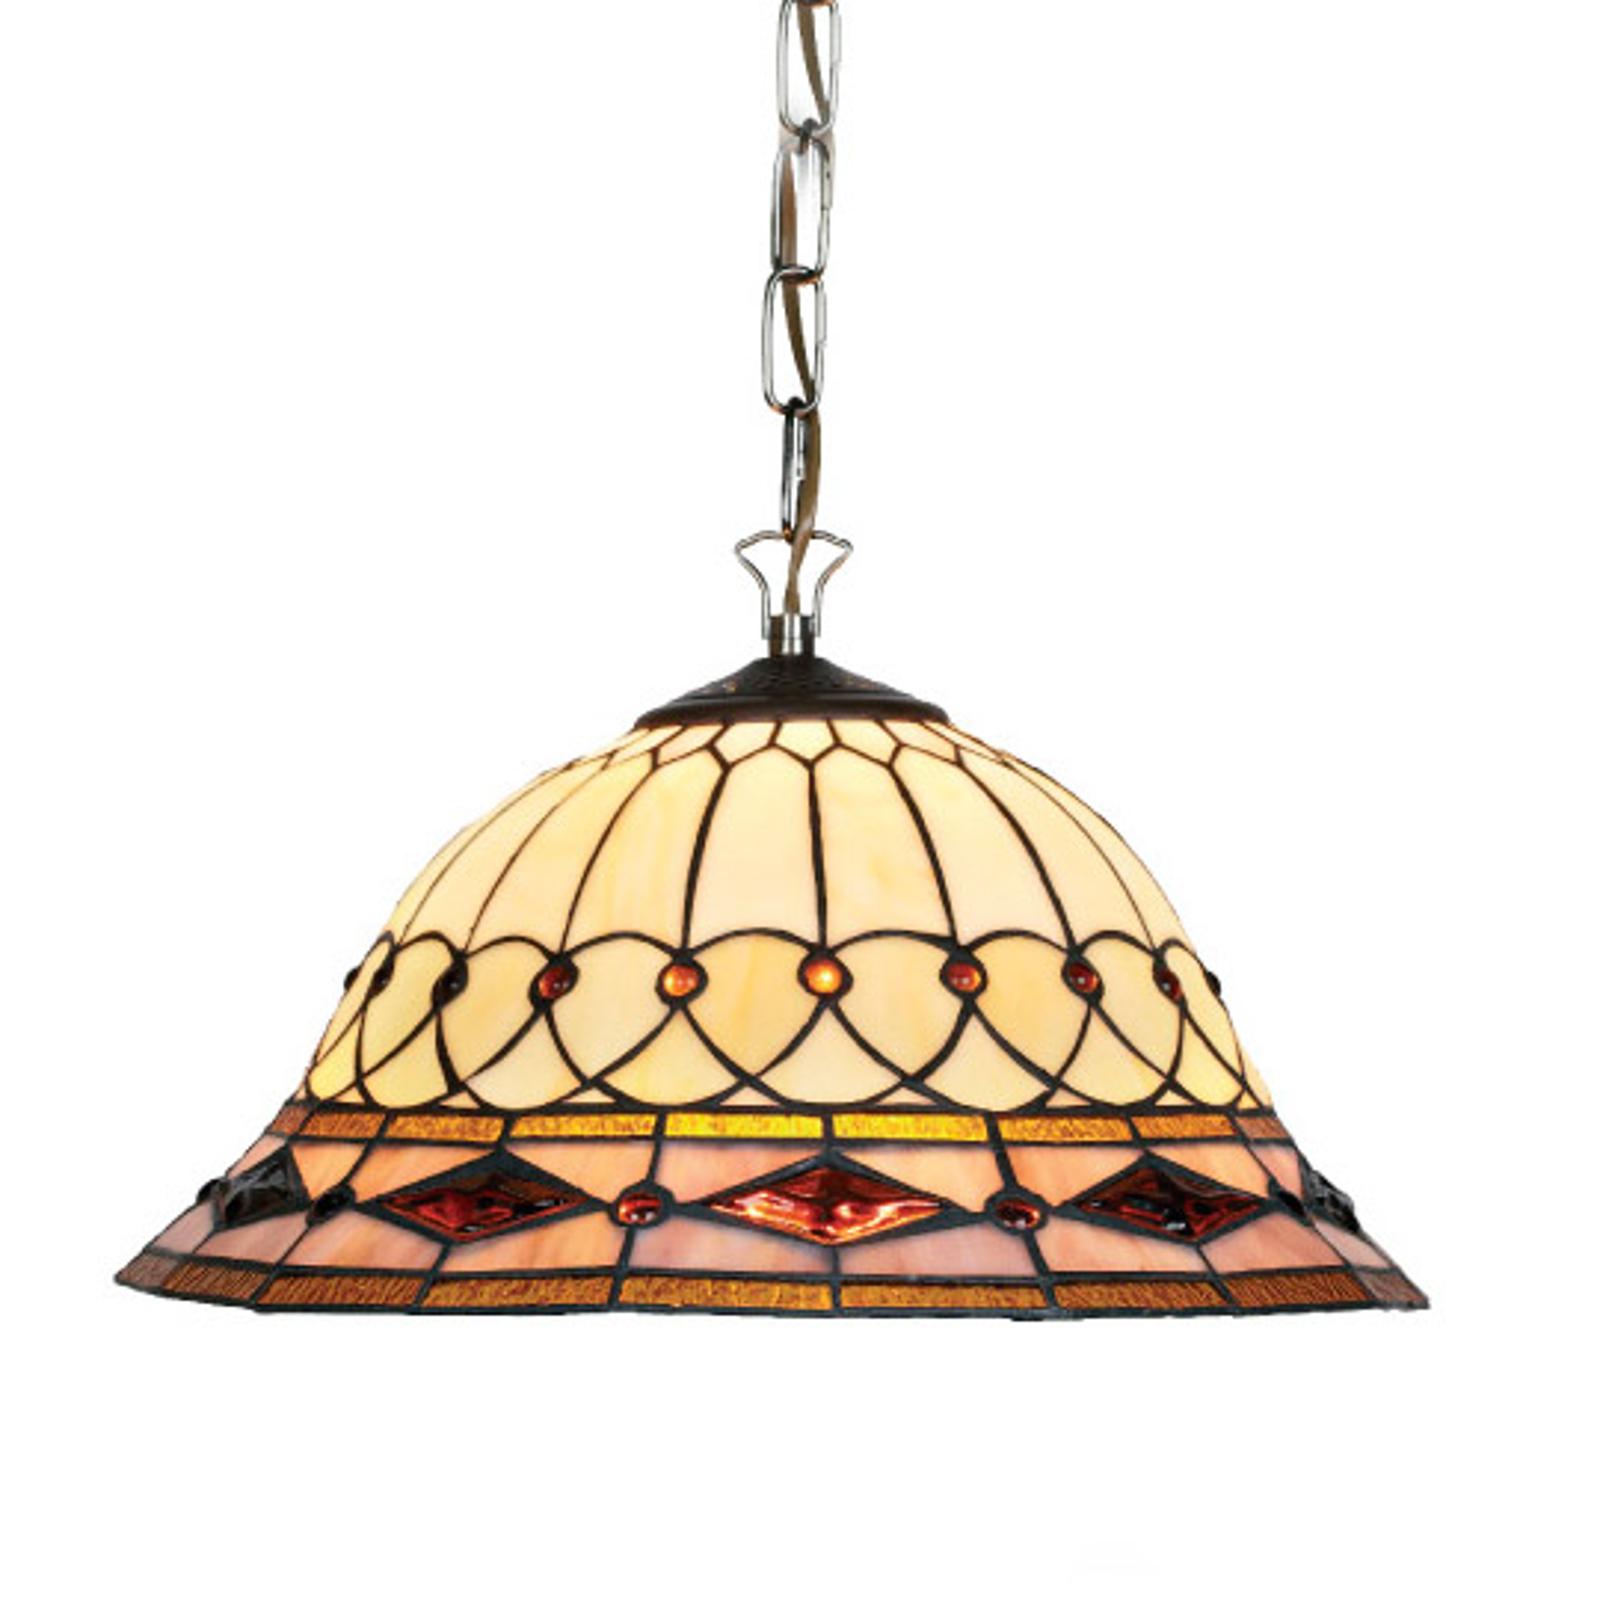 Lampada sospensione Kassandra stile tiffany, 2xE27